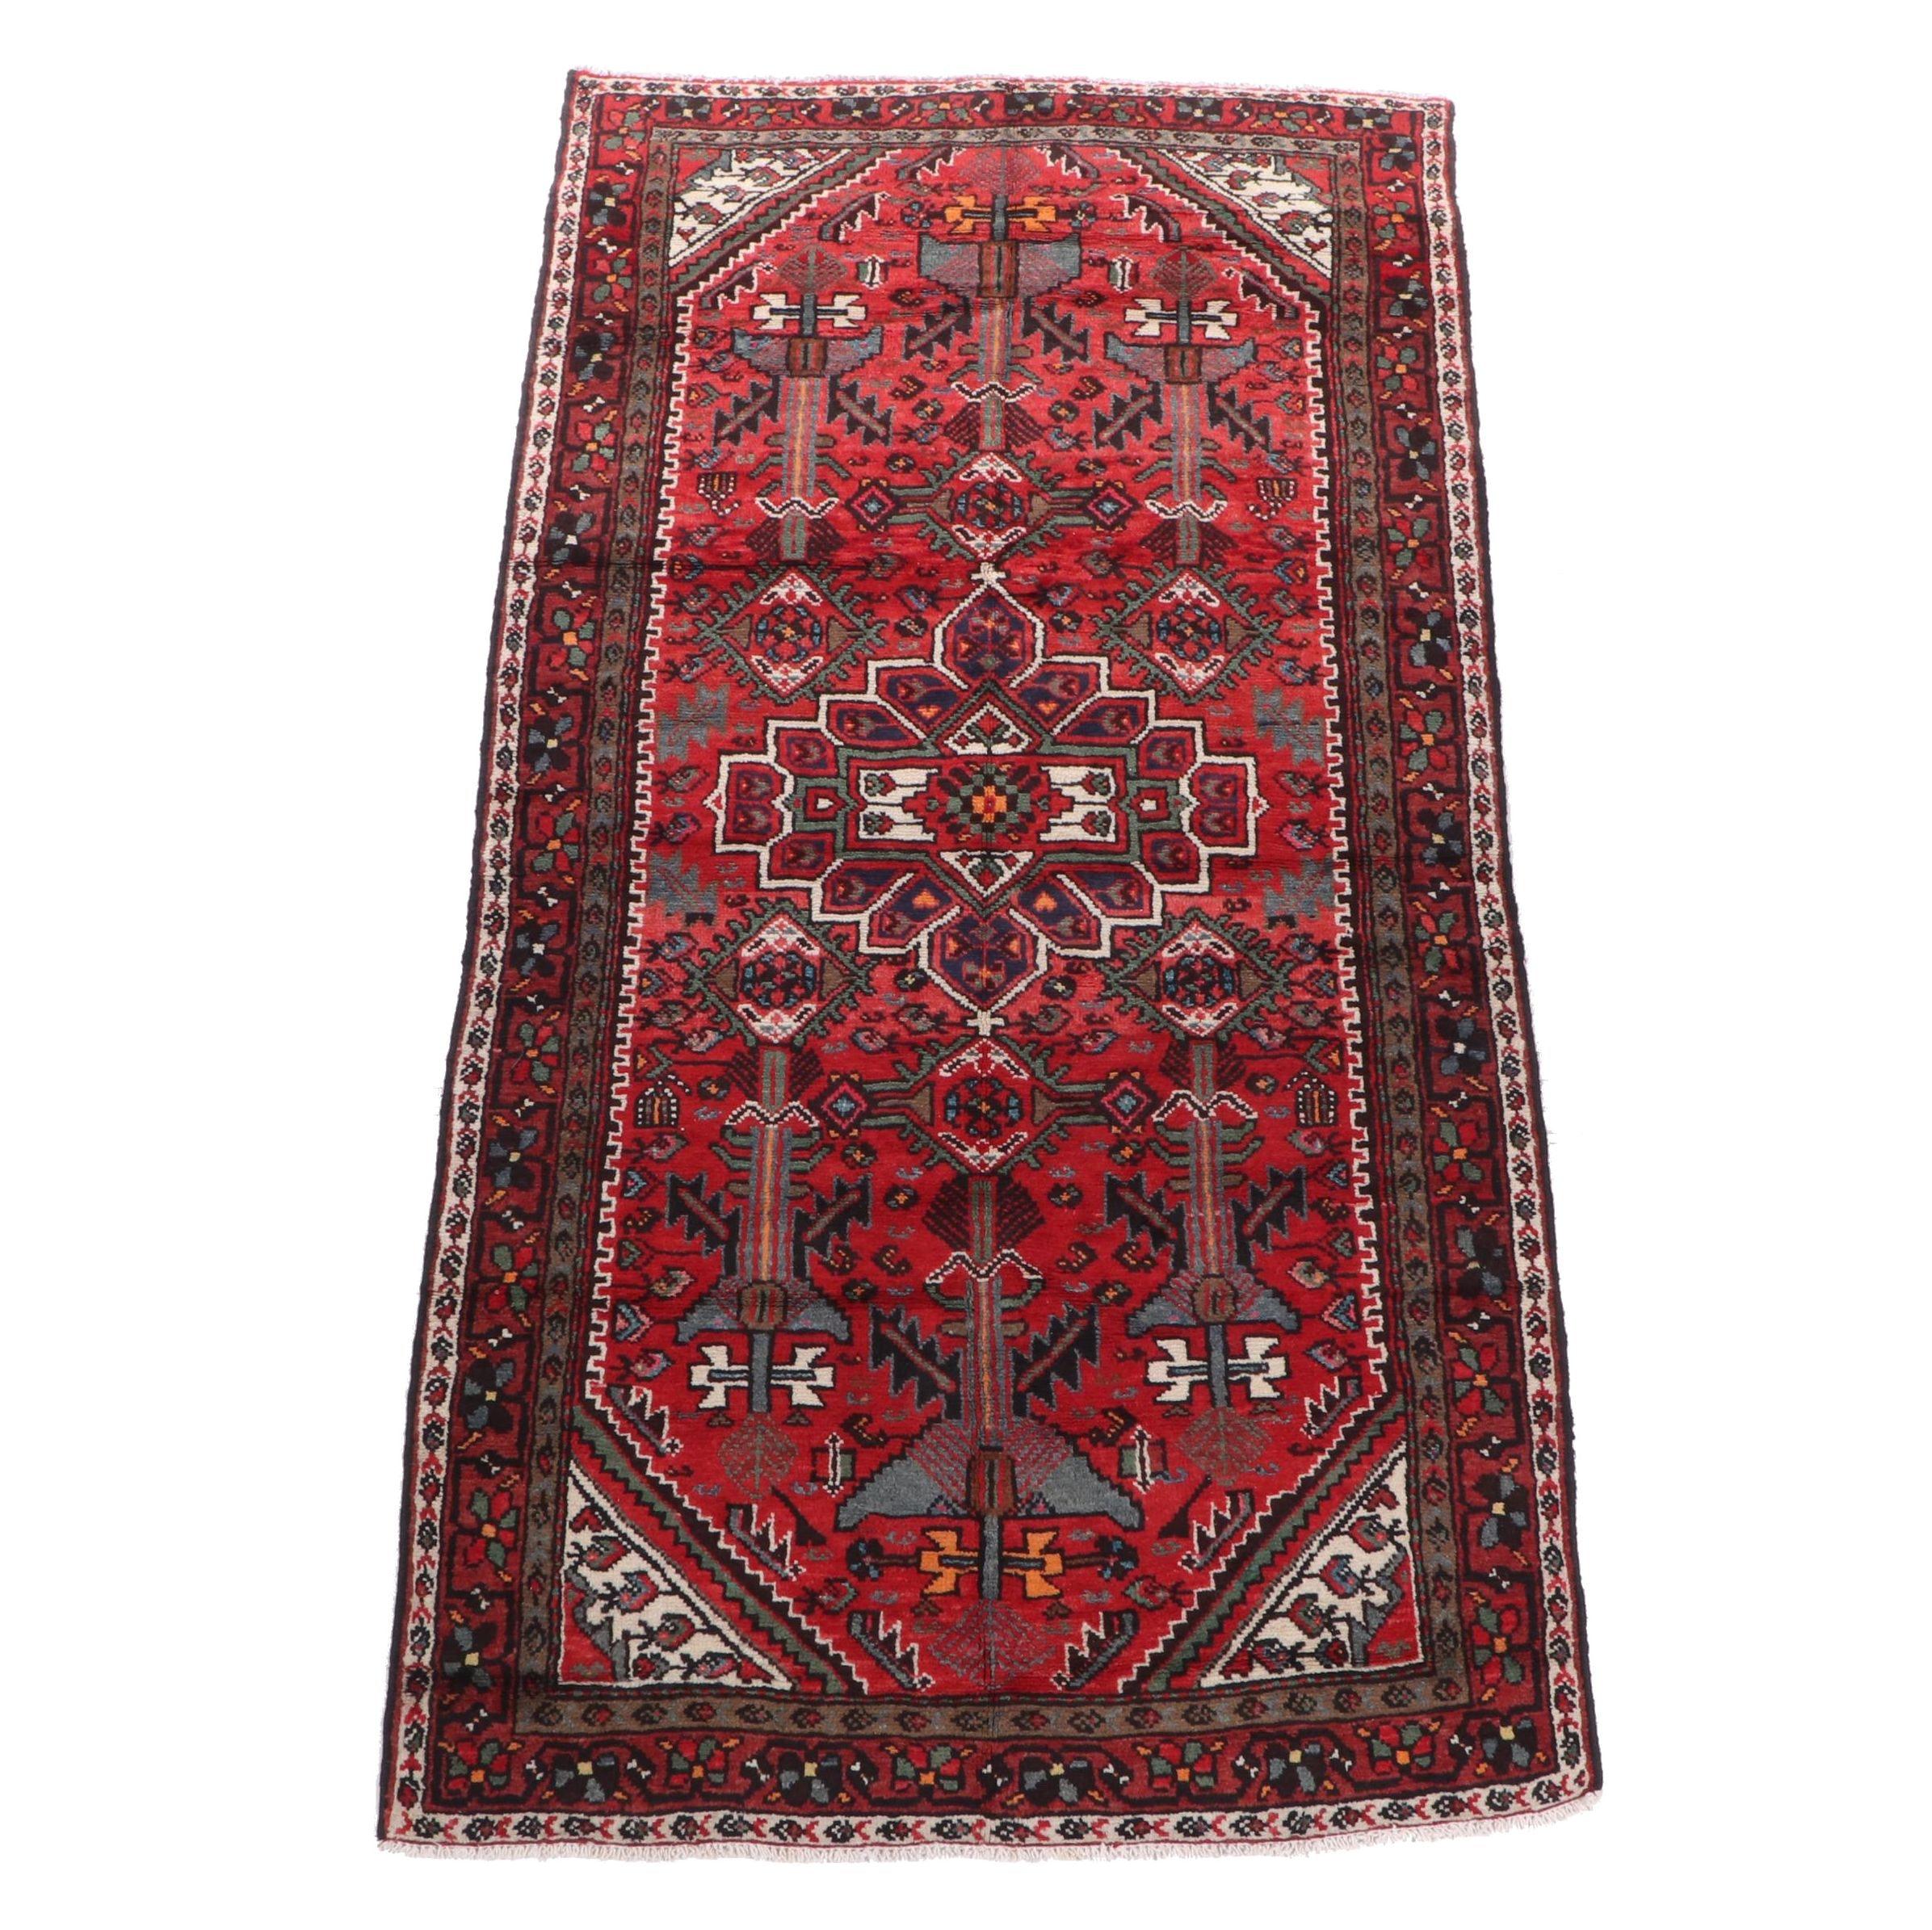 Hand-Knotted Persian Zanjan Wool Area Rug